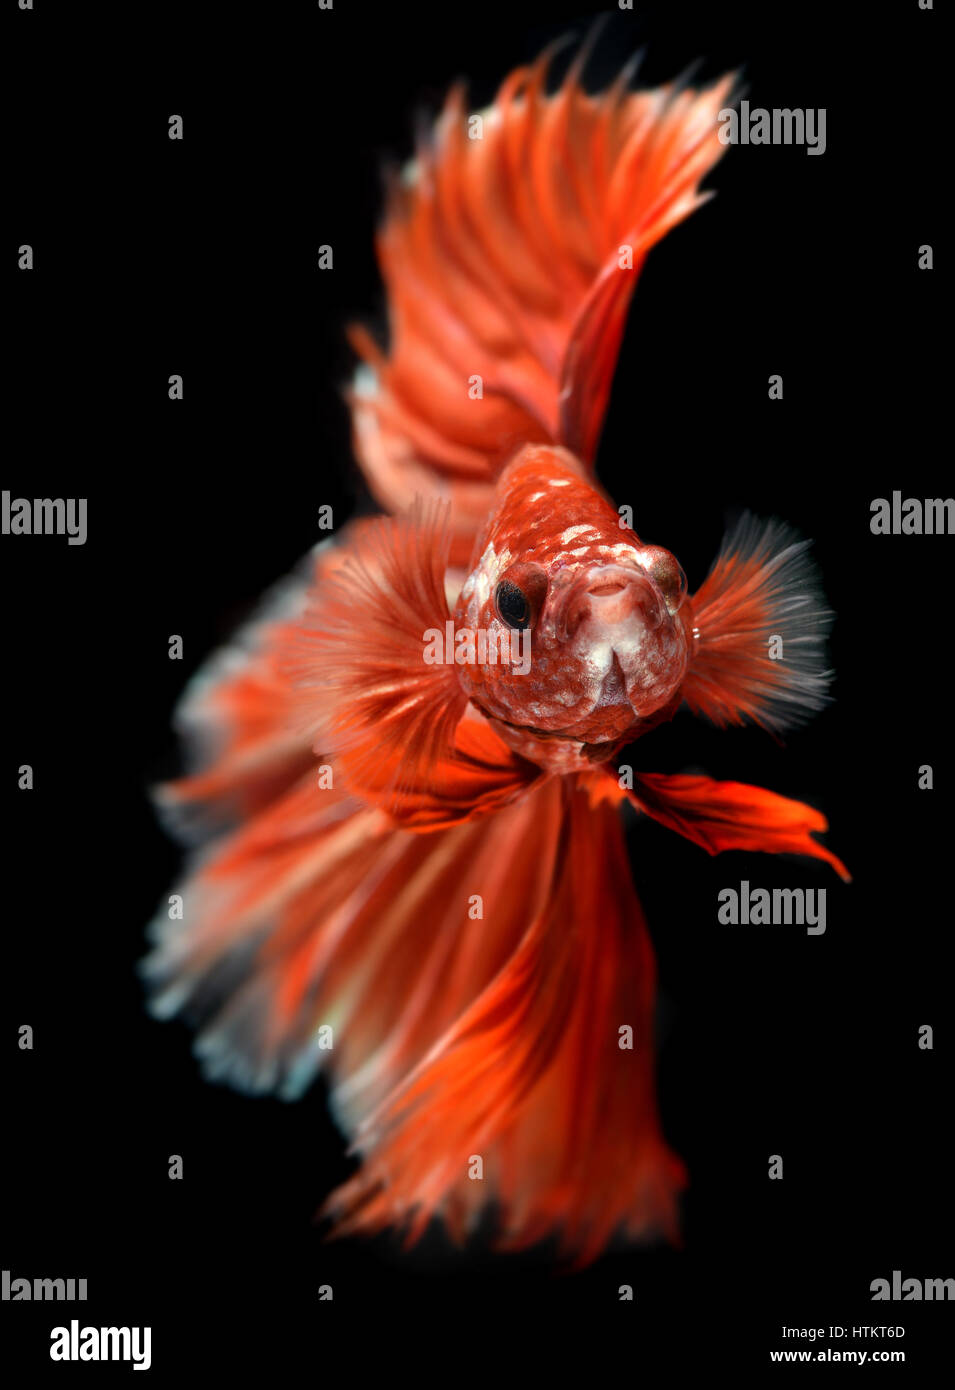 Rojo dorado vacilar de Betta Saimese coloridos peces combates belleza y libertad en fondo negro con iluminación Imagen De Stock